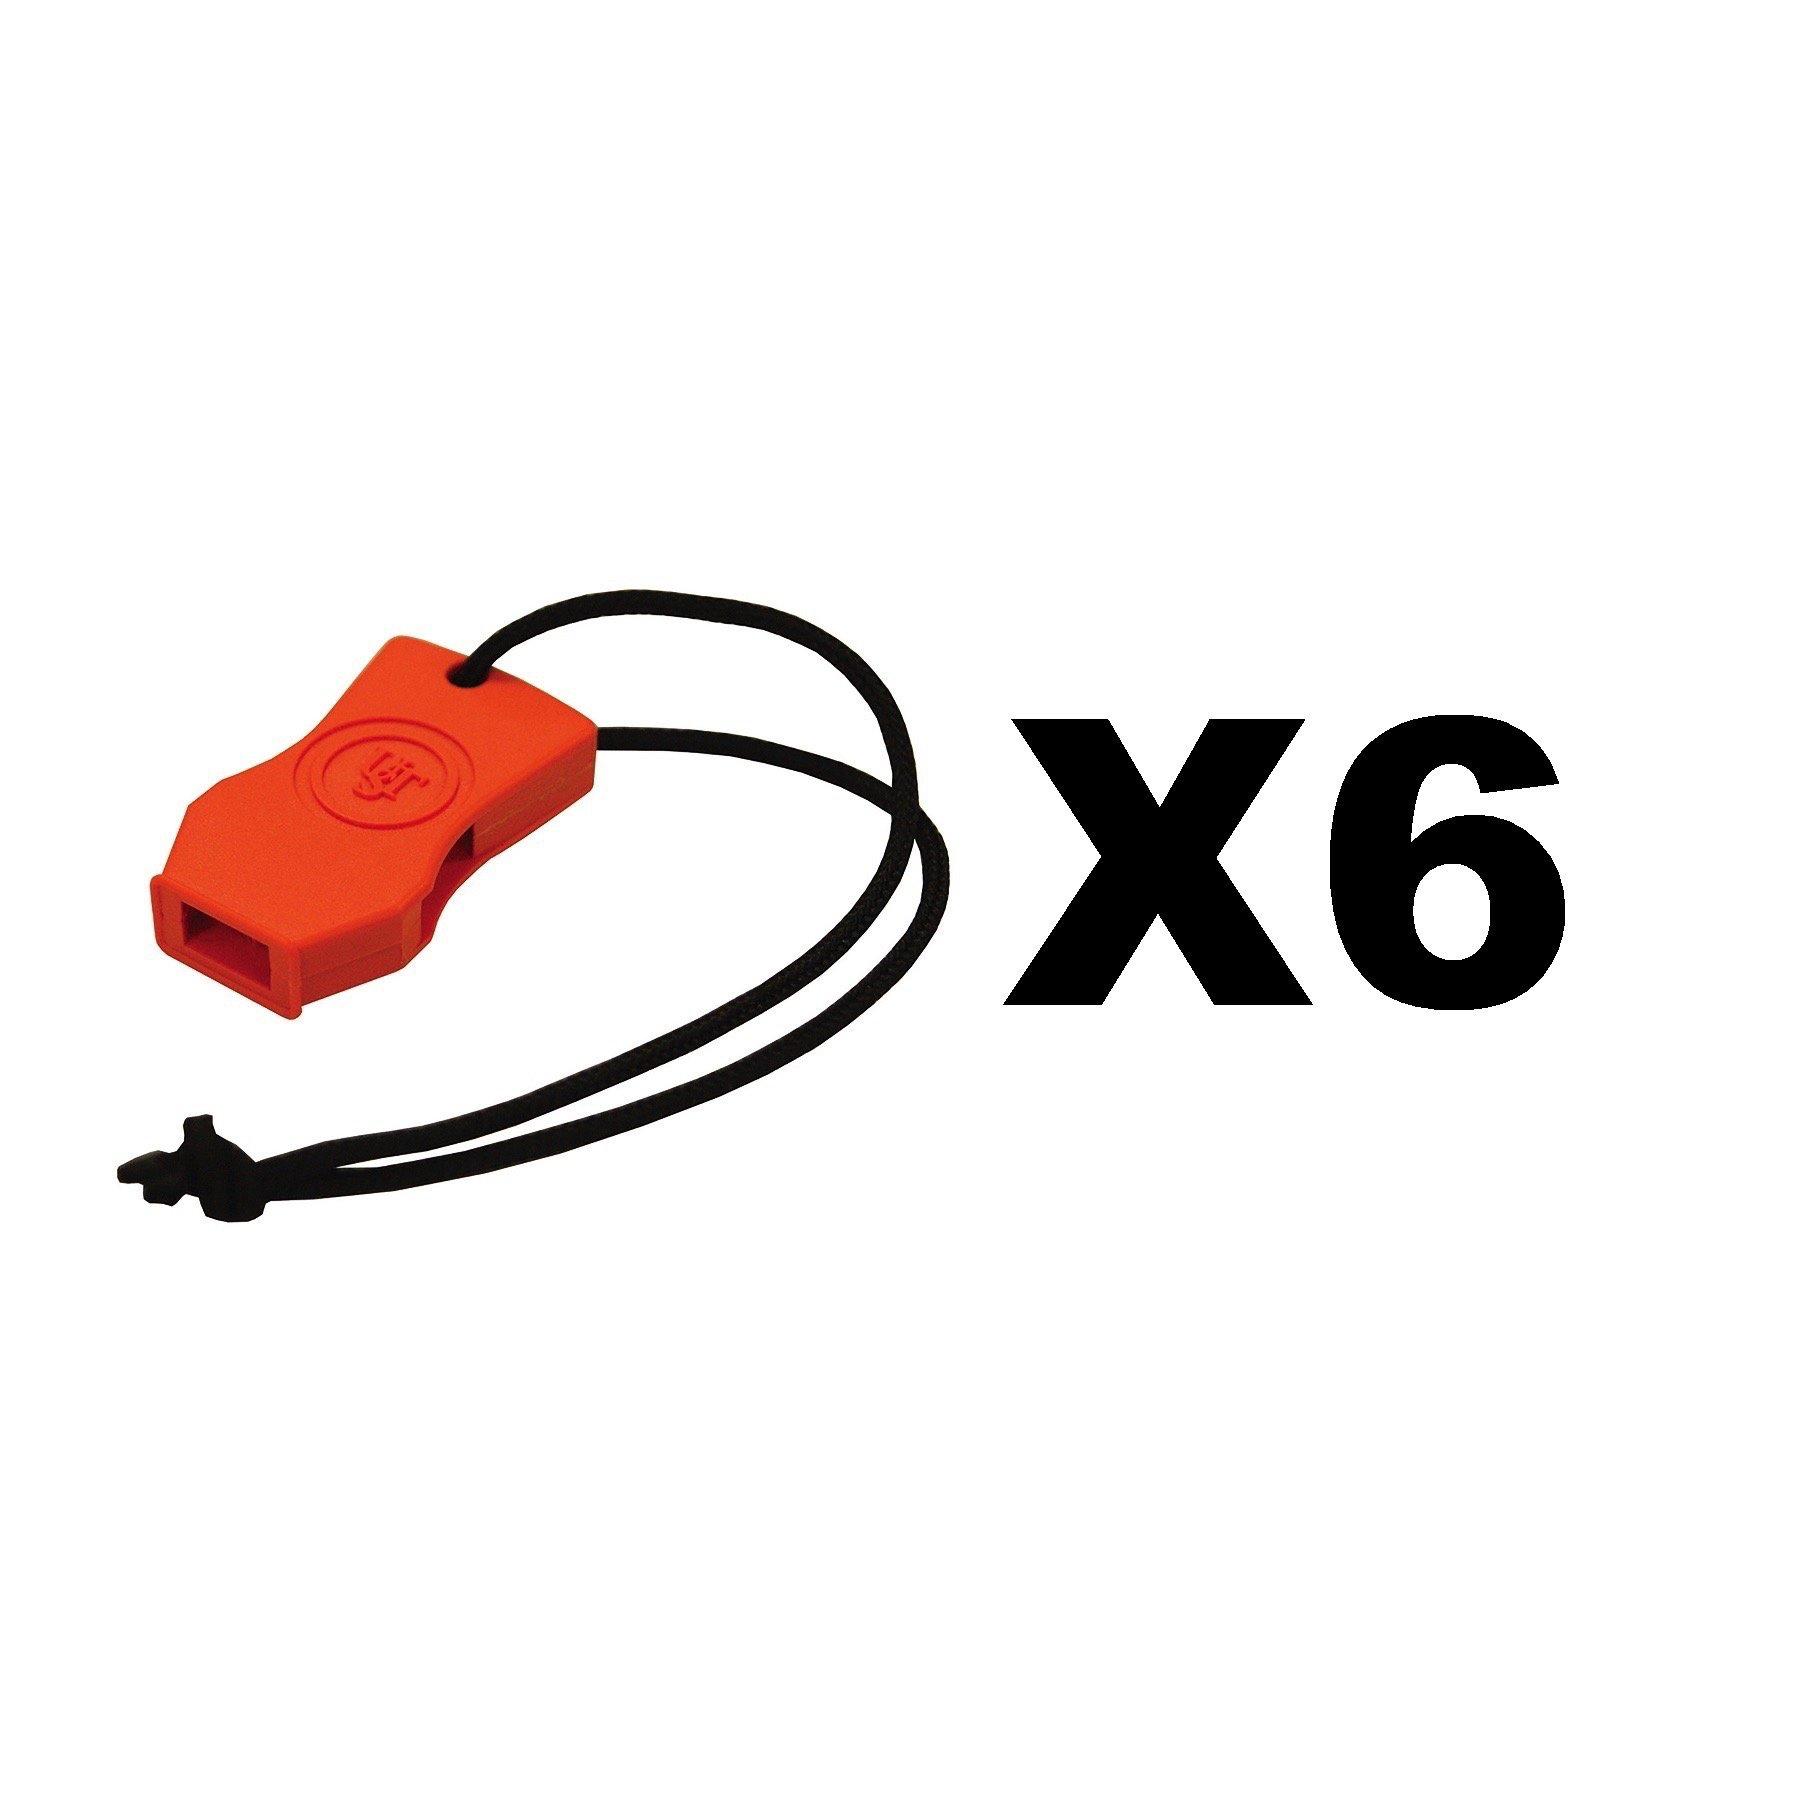 Ultimate Survival Technologies JetScream Micro Whistle Orange Signal (6-Pack)